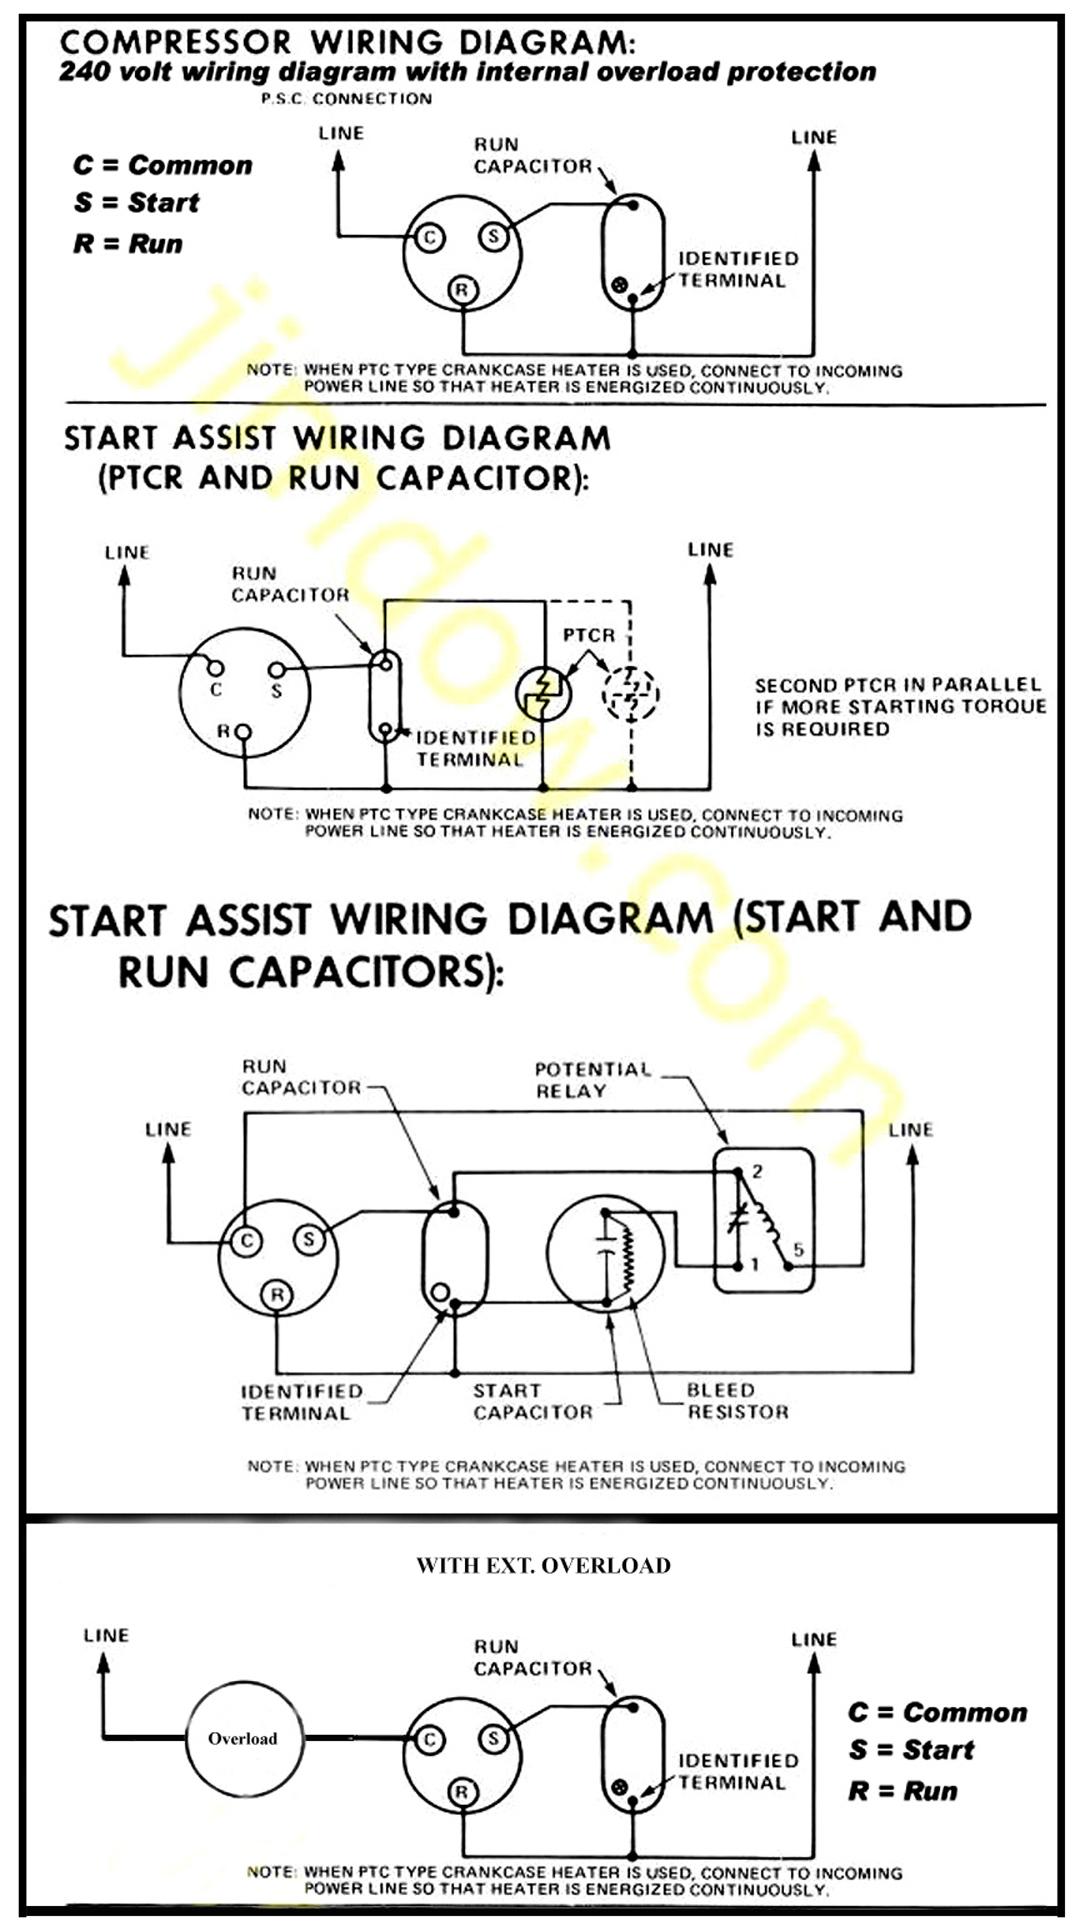 A C Compressor Wiring - Wiring Diagrams Hubs - Ac Compressor Wiring Diagram